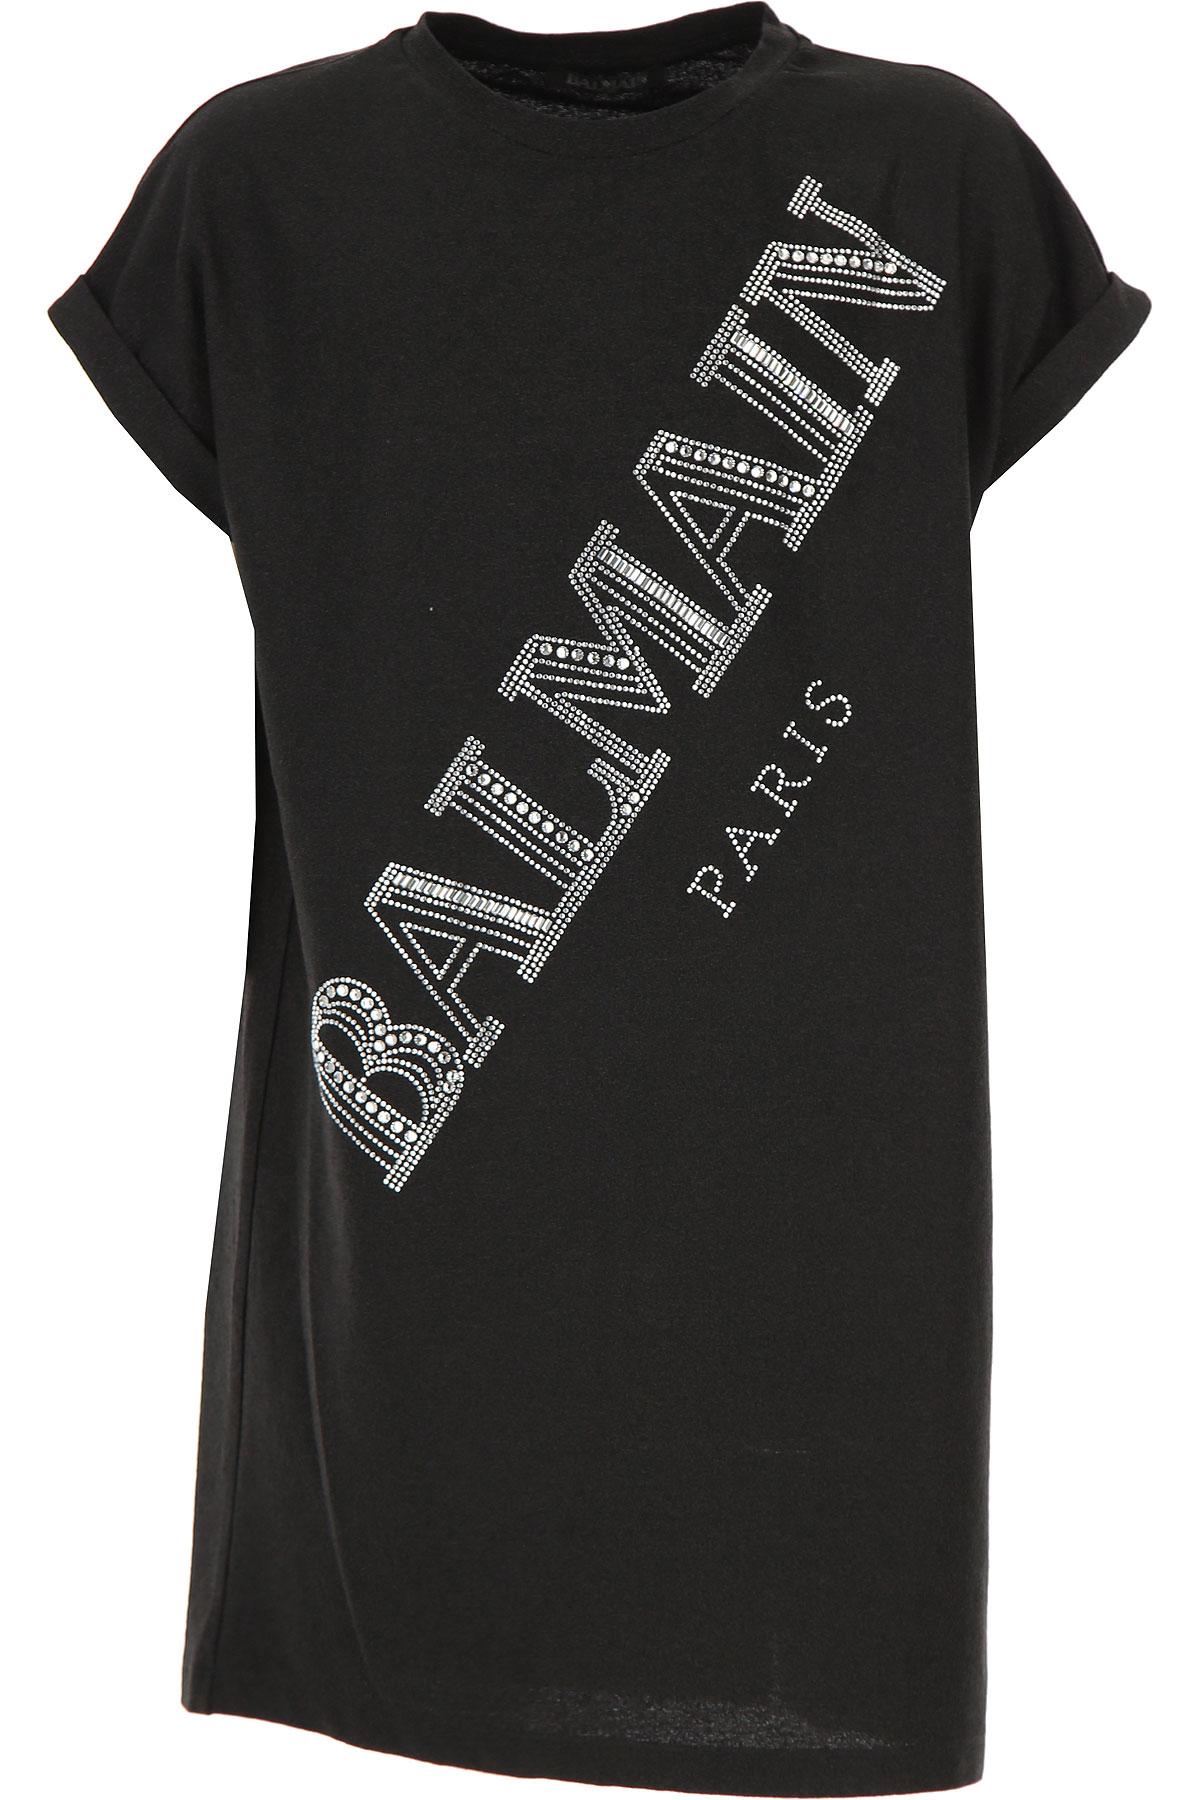 Balmain Girls Dress On Sale, Black, Viscose, 2019, 10Y 12Y 14Y 16Y 8Y